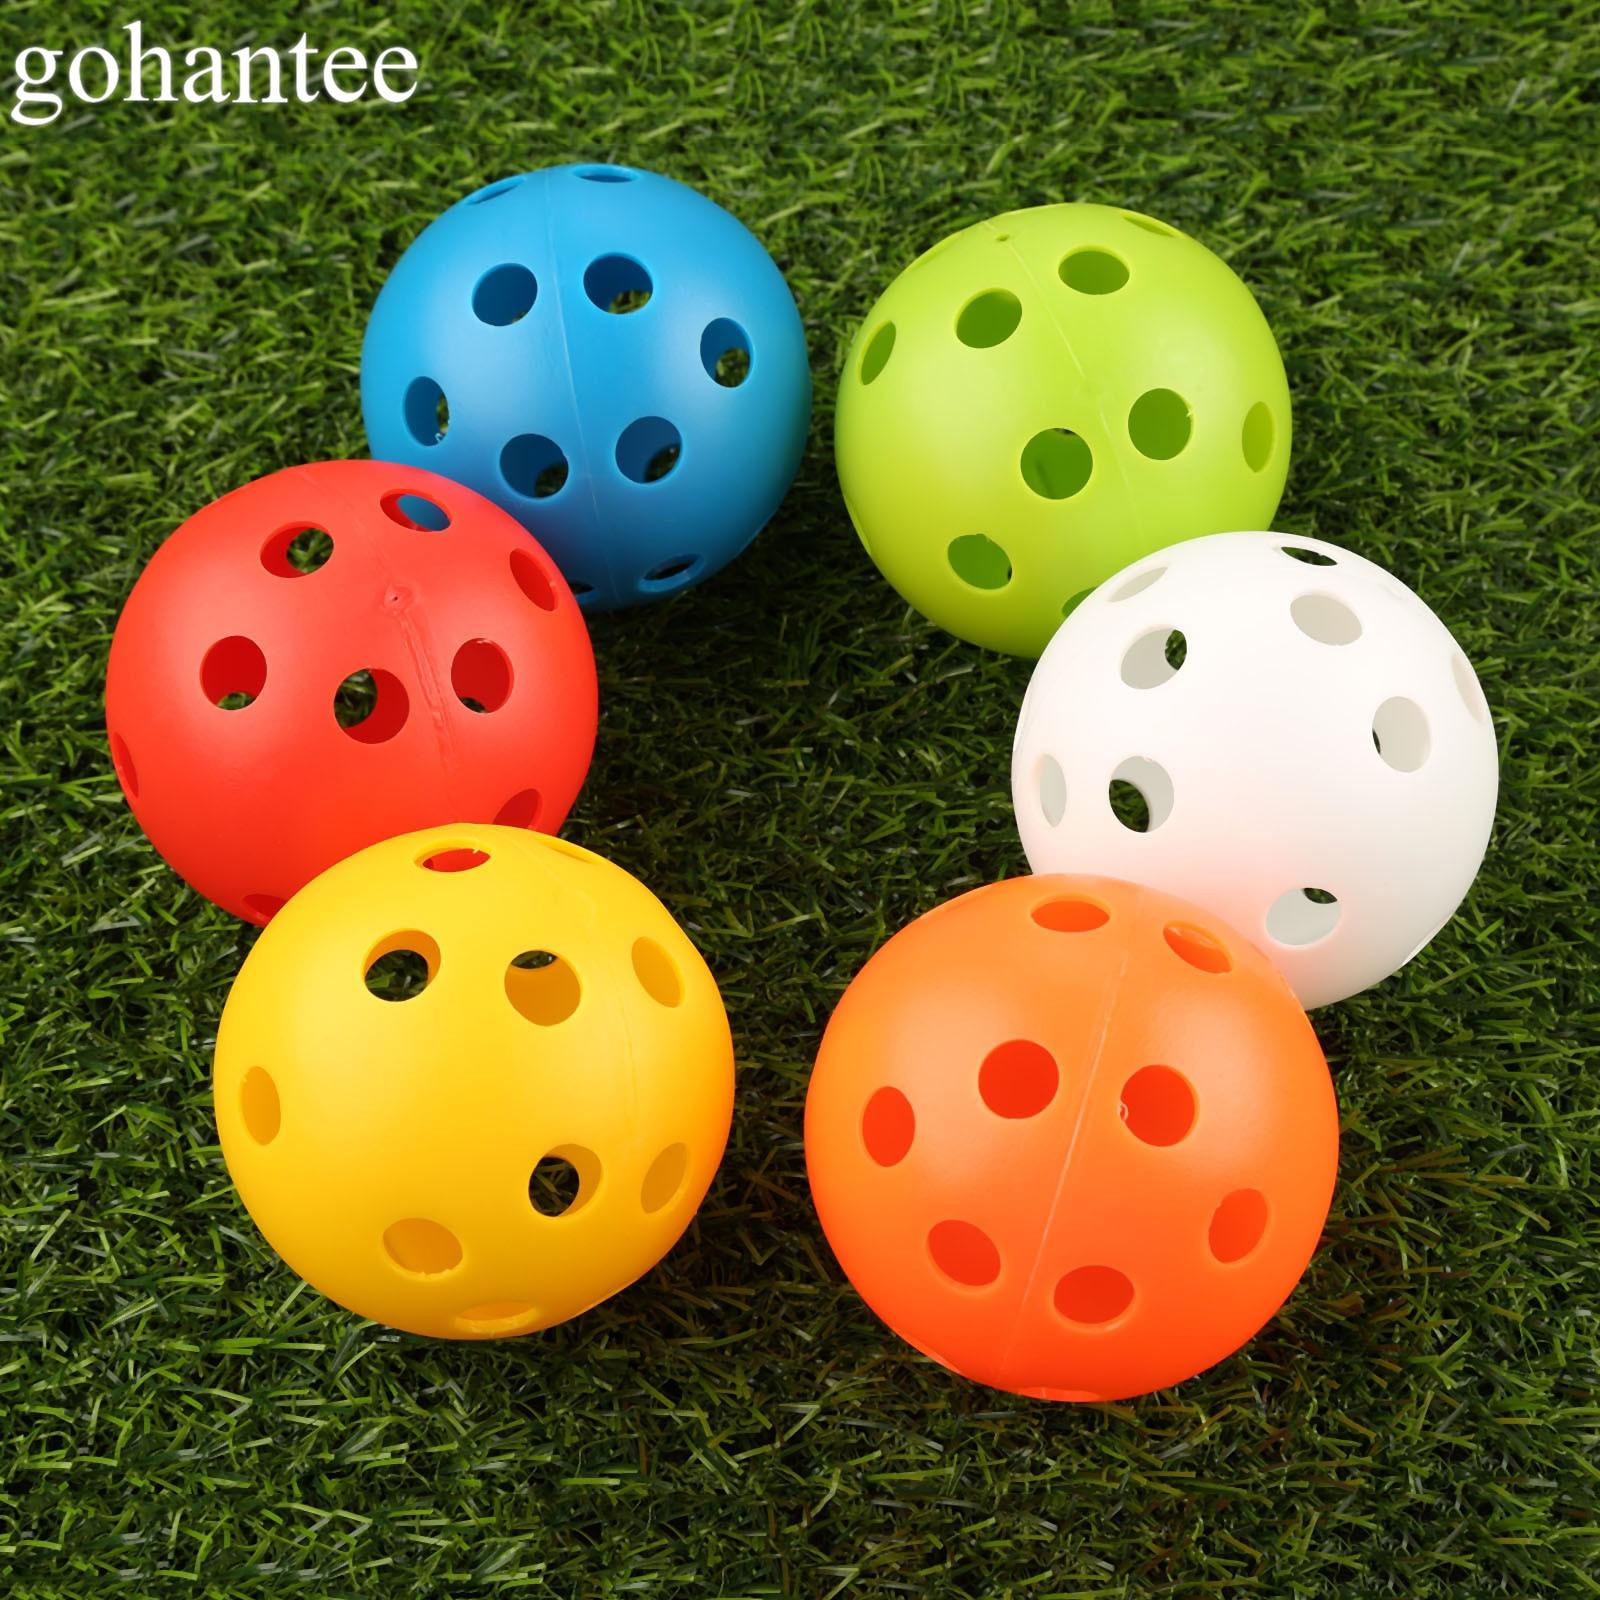 Gohantee 10Pcs 72mm Golf Training Balls Plastic Airflow Hollow With Hole Golf Balls Outdoor Golf Practice Balls Golf Accessories